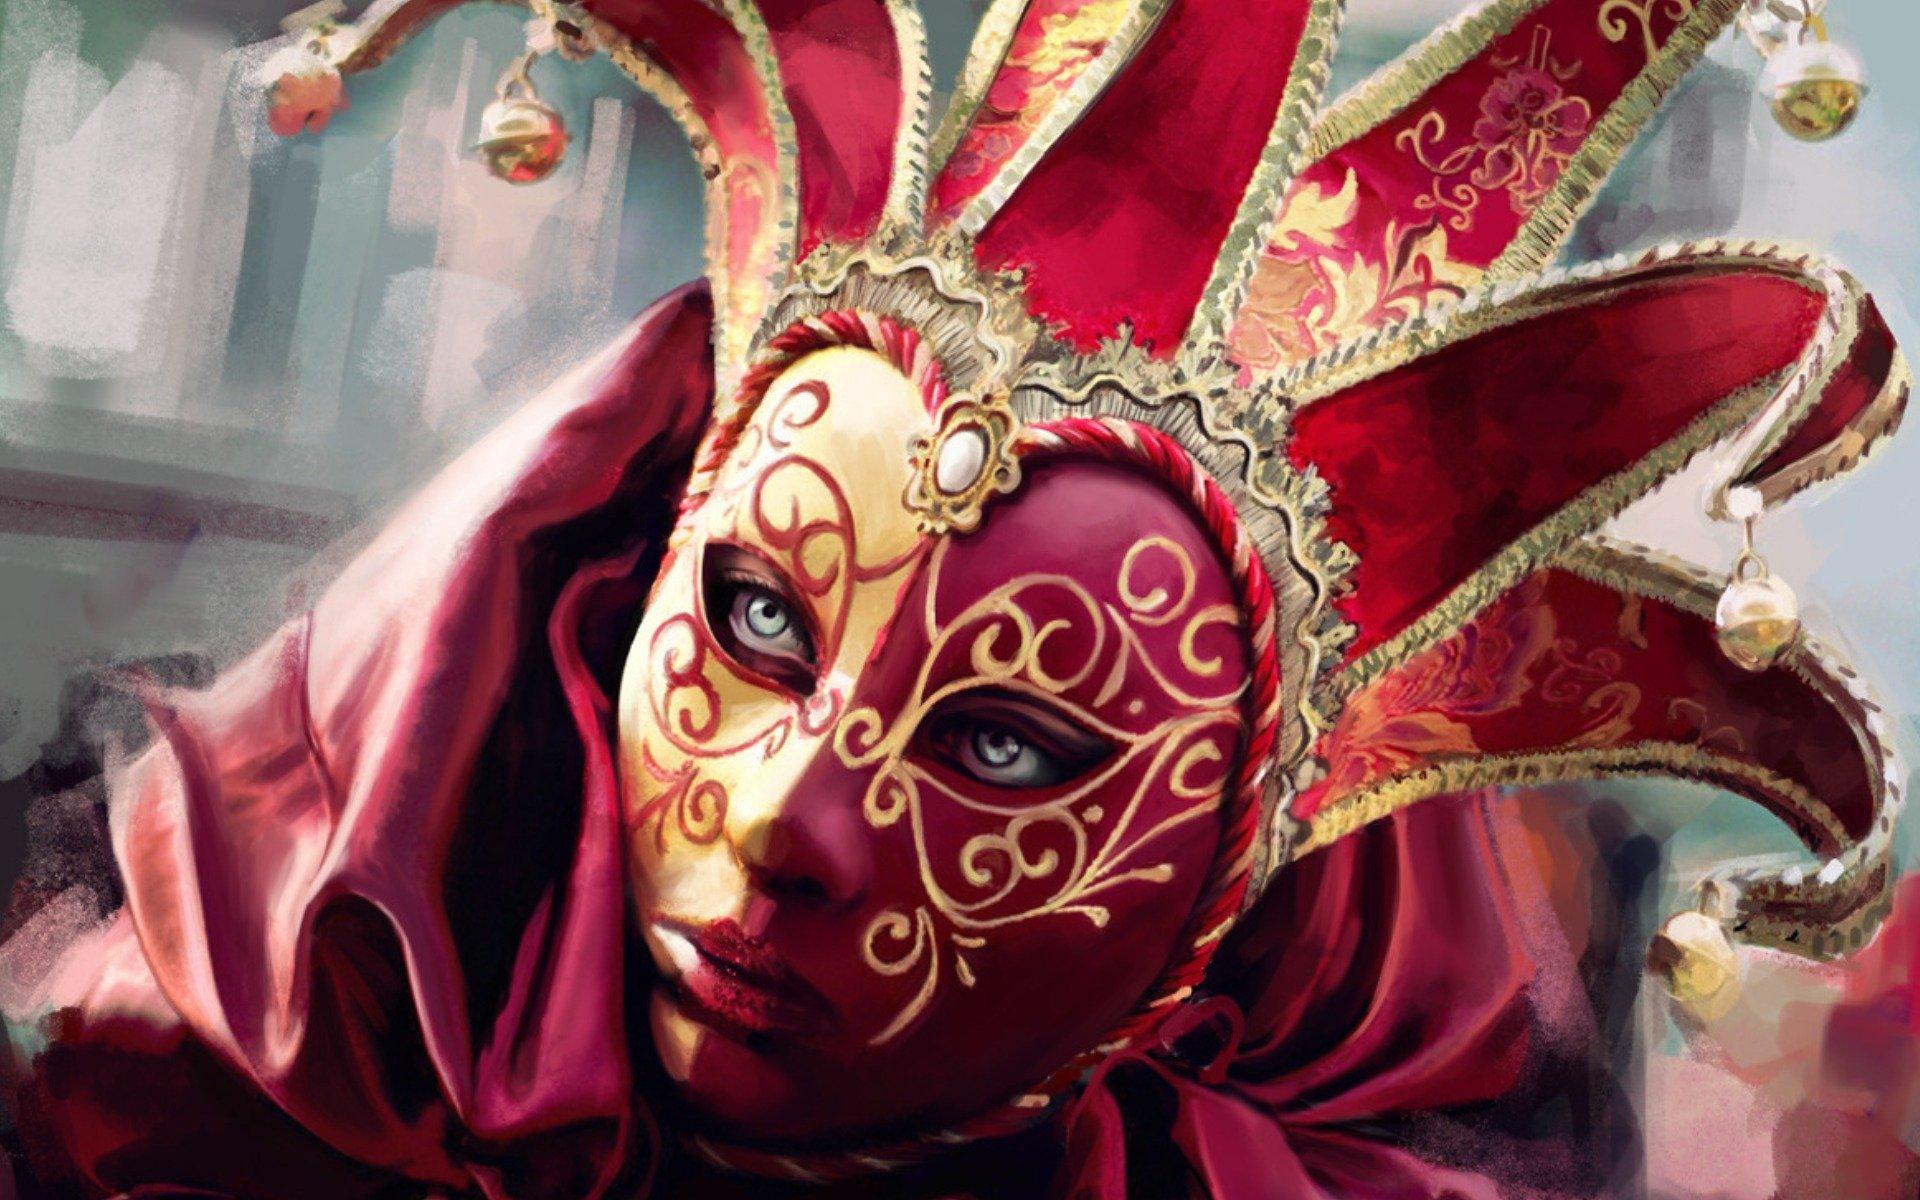 Portrait mask colorful festival fantasy artwork art painting wallpaper |  1920x1200 | 450170 | WallpaperUP